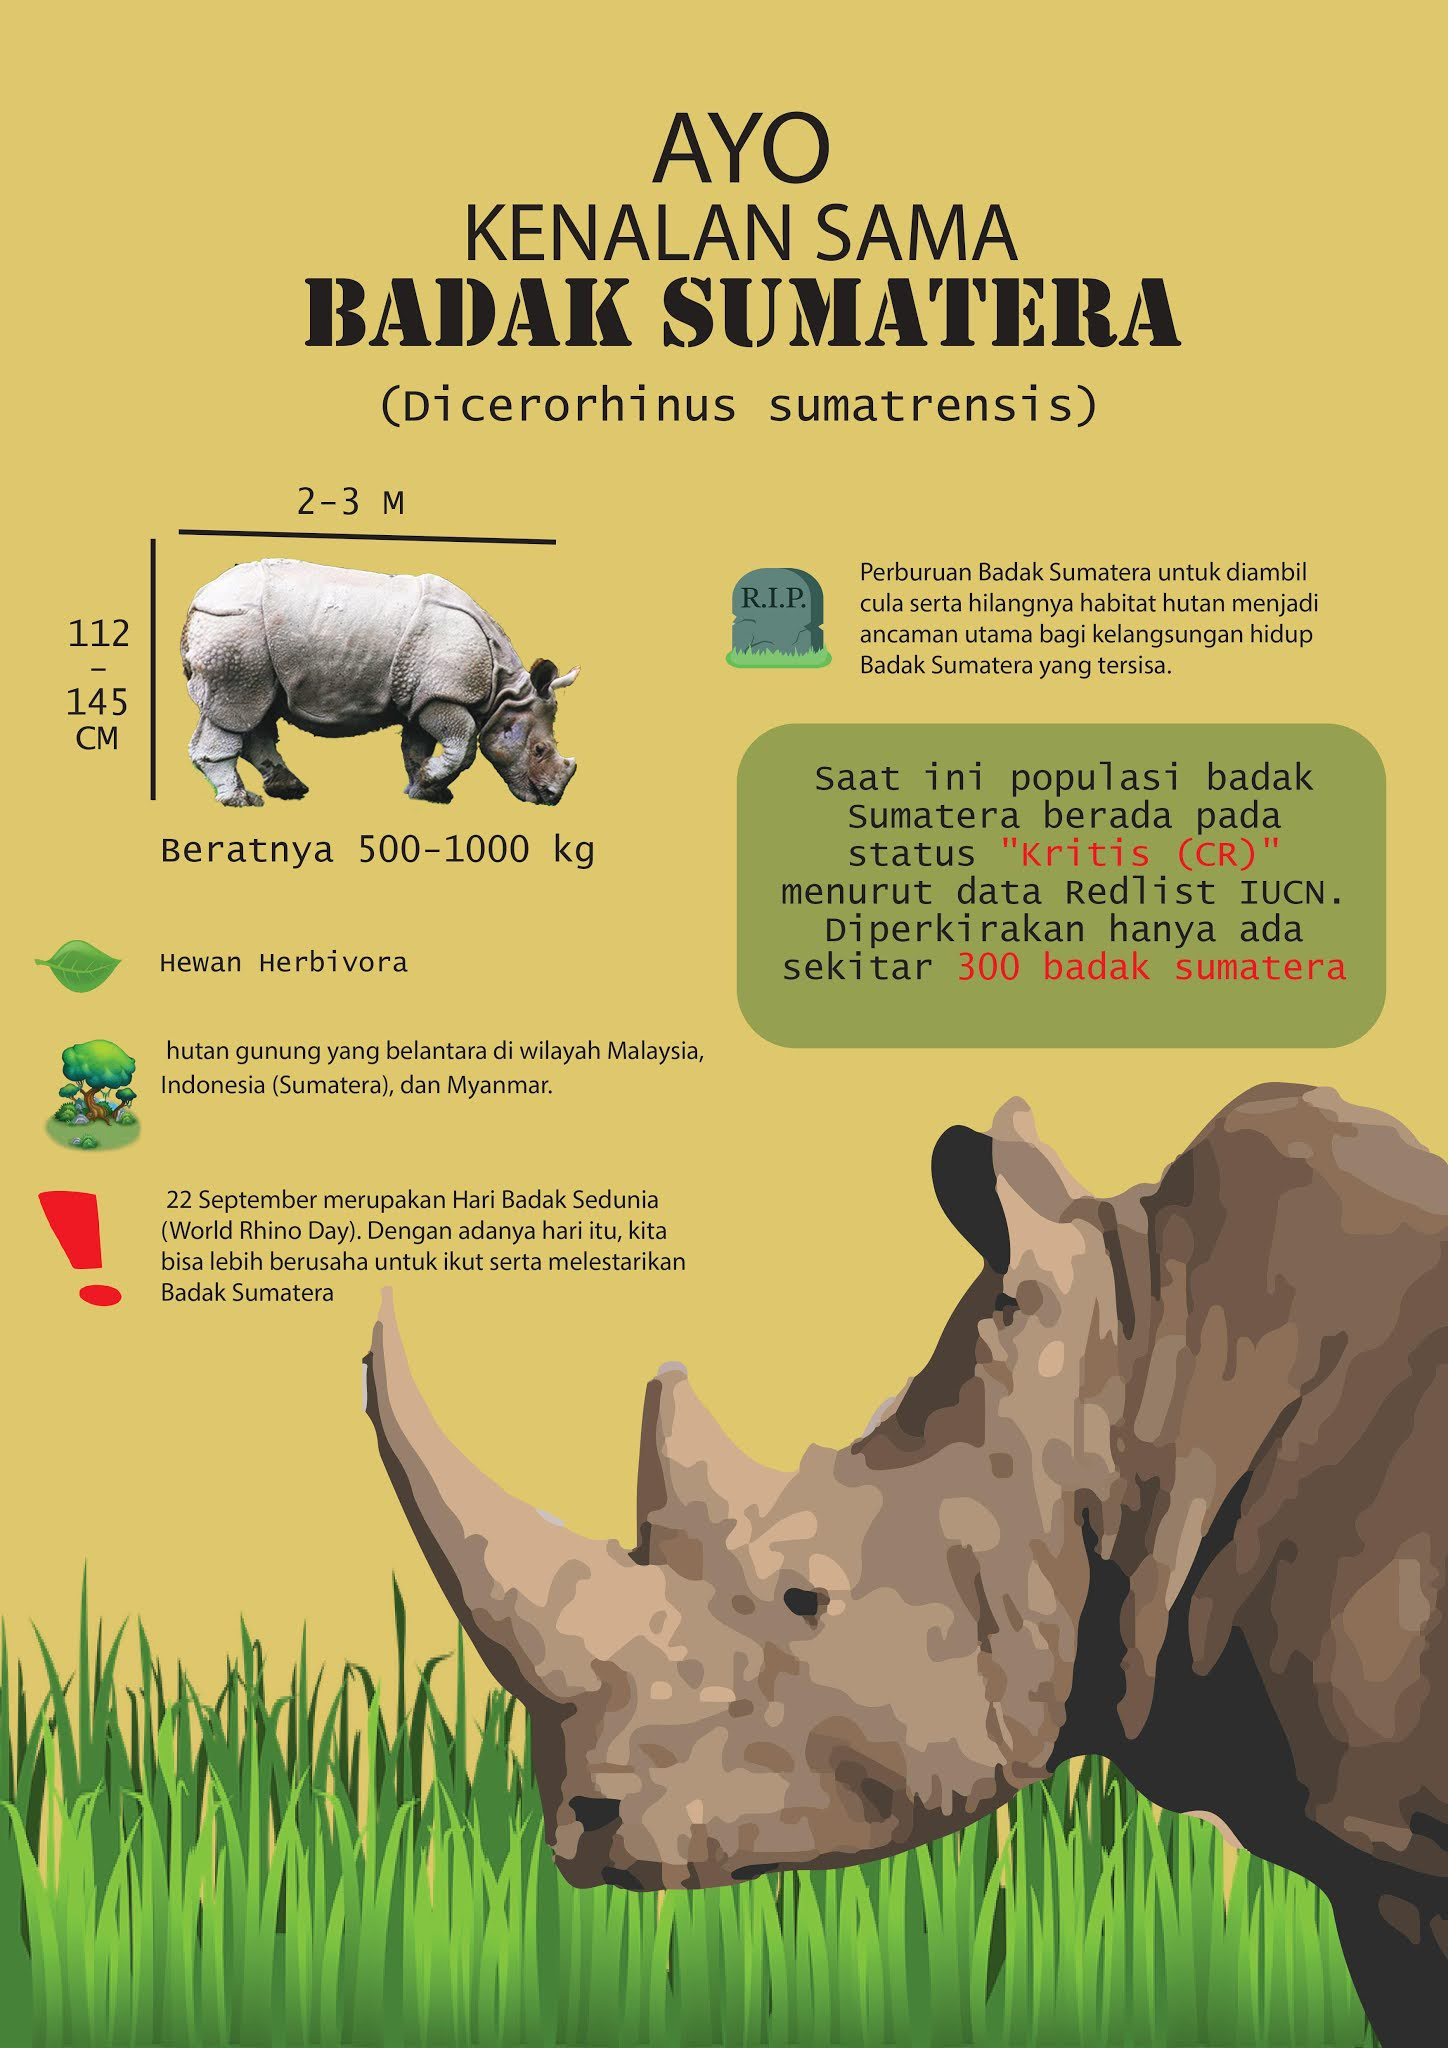 Ayo Kita Kenalan Sama Badak Sumatera Petualangan Kata